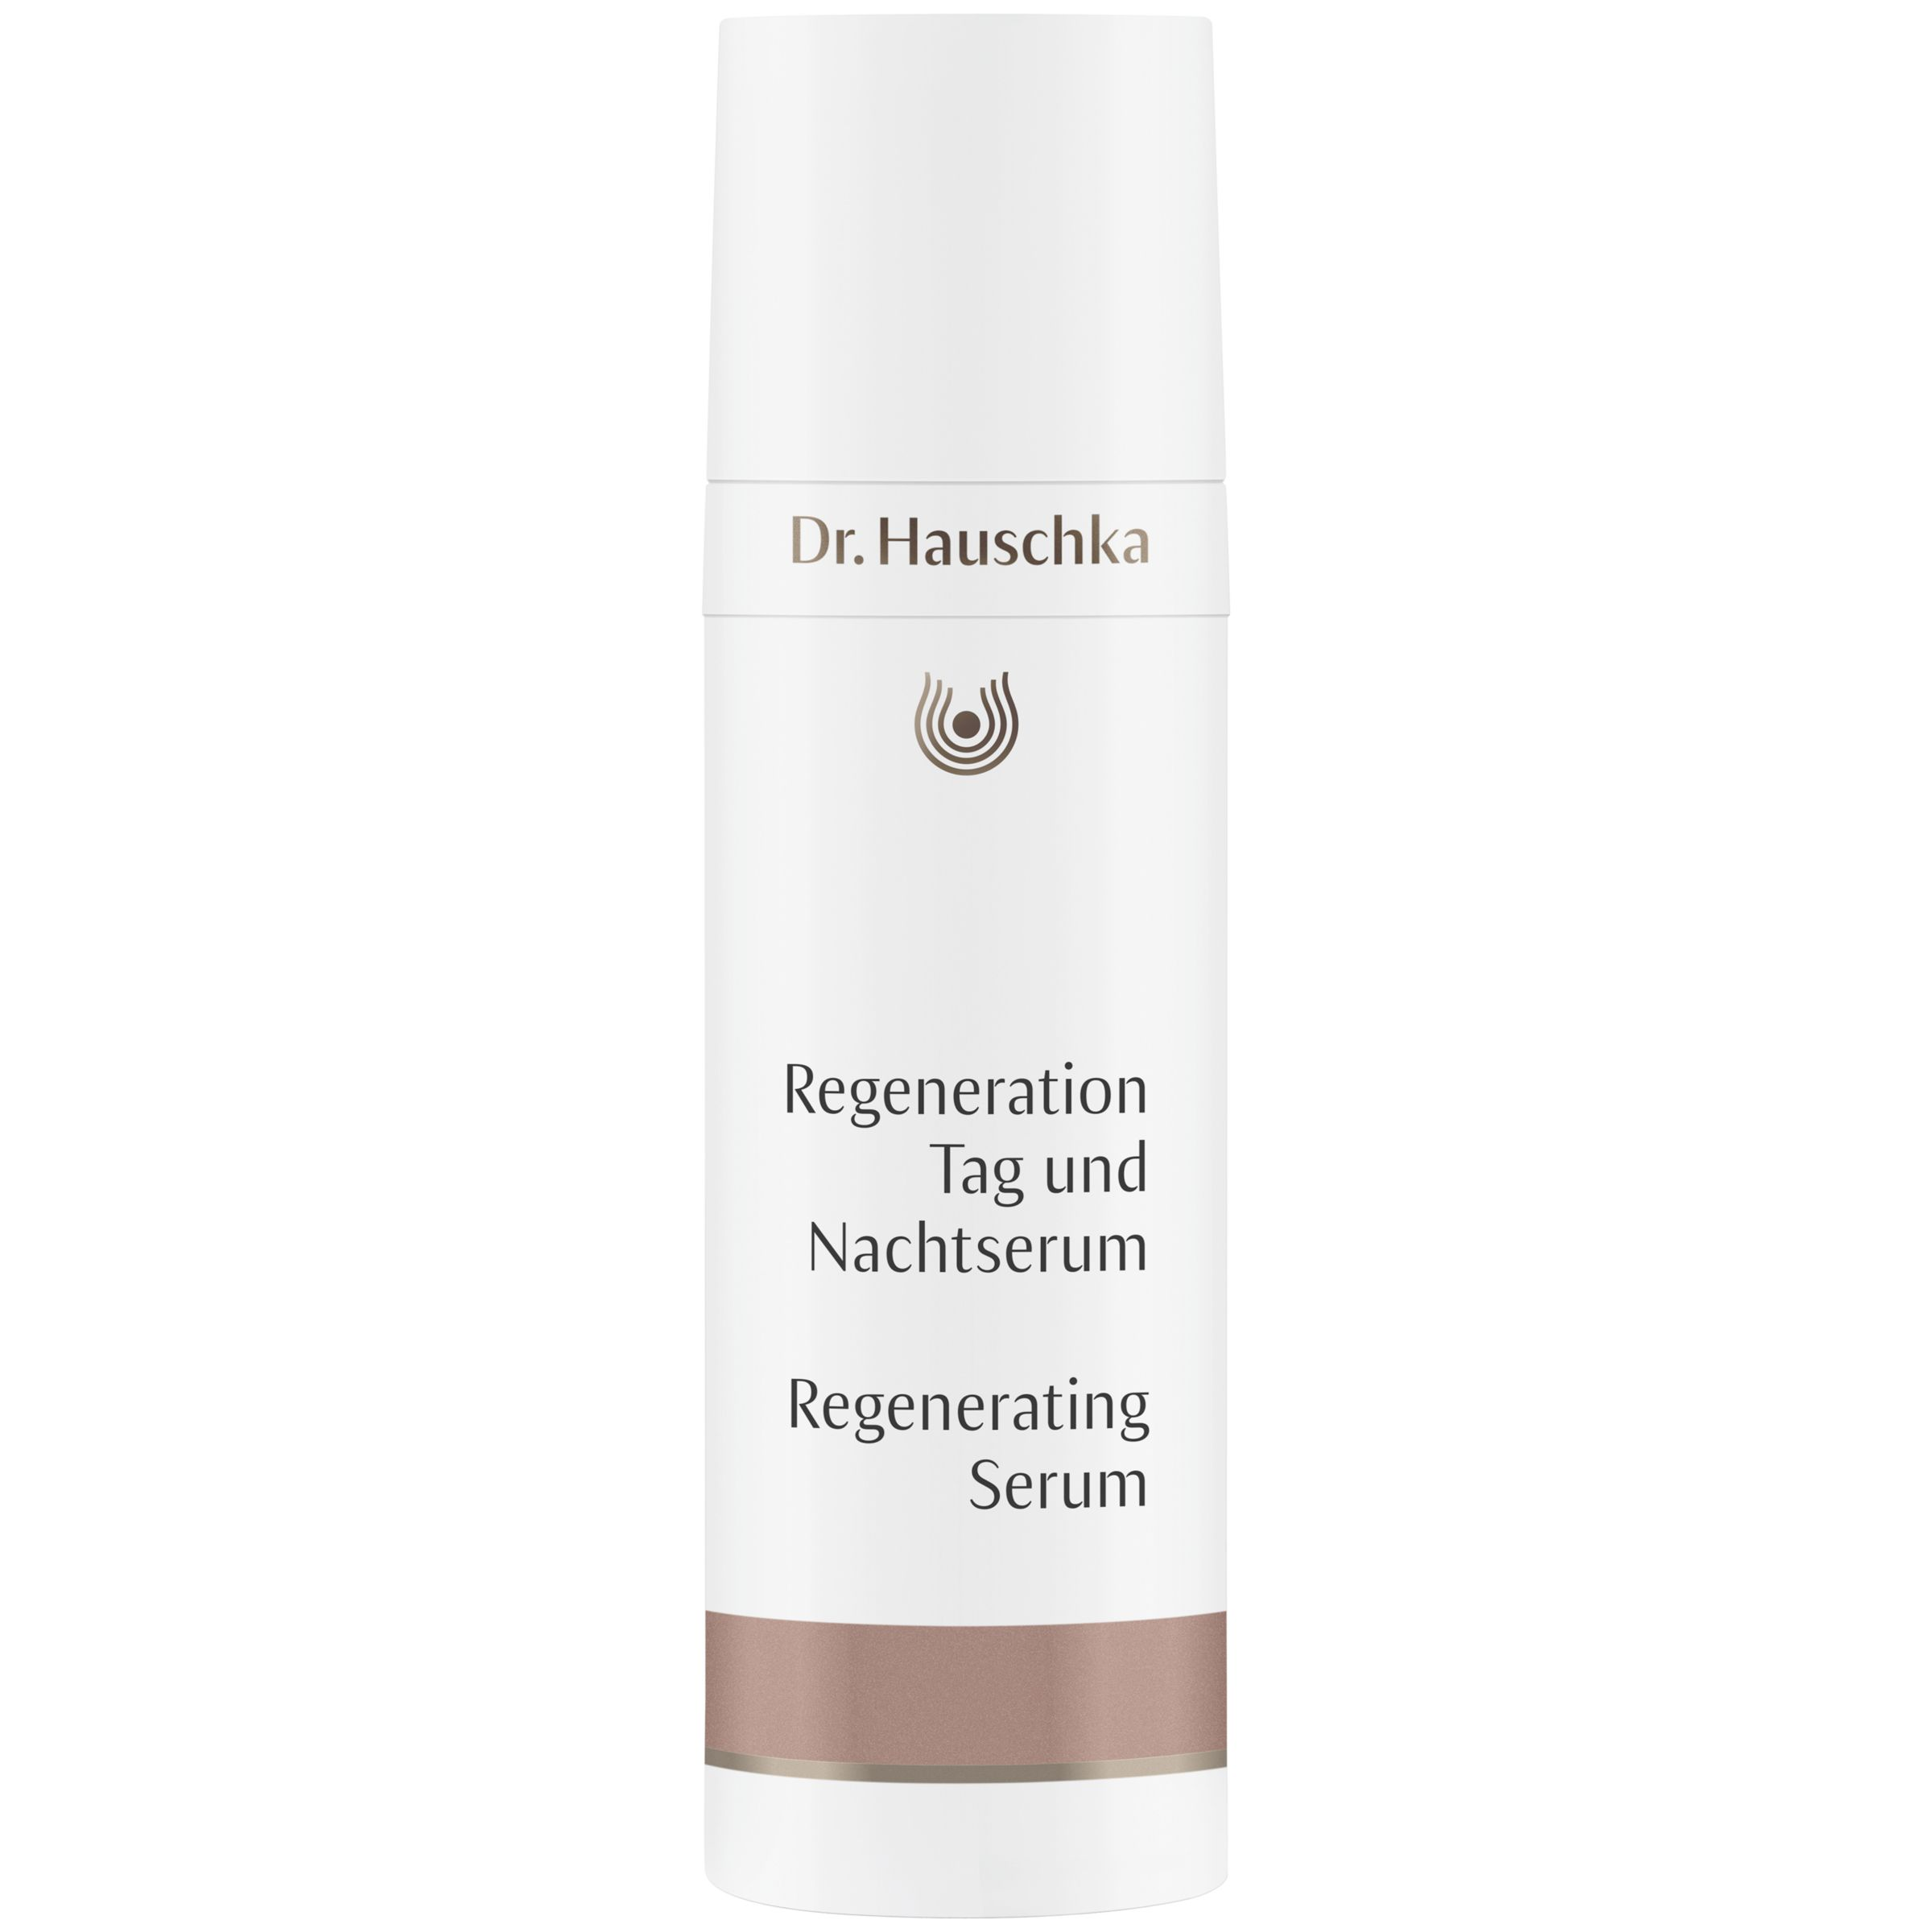 Dr Hauschka Dr Hauschka Regenerating Serum, 30g